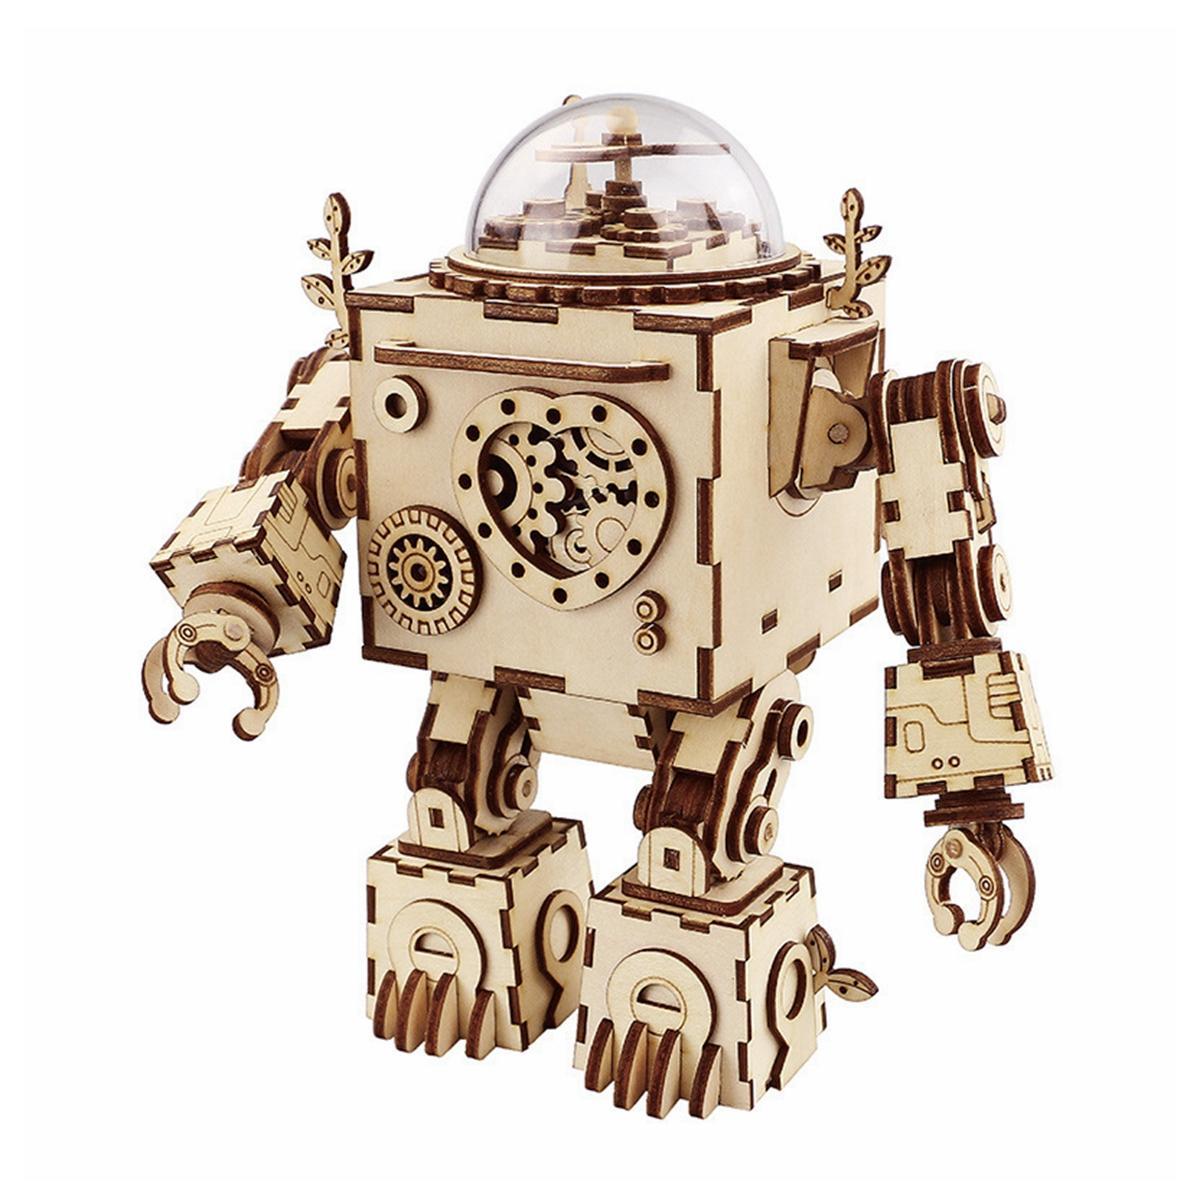 Retro Heart Shaped Telephone Model Music Box Home Ornament Decoration Music Box Toy - 1